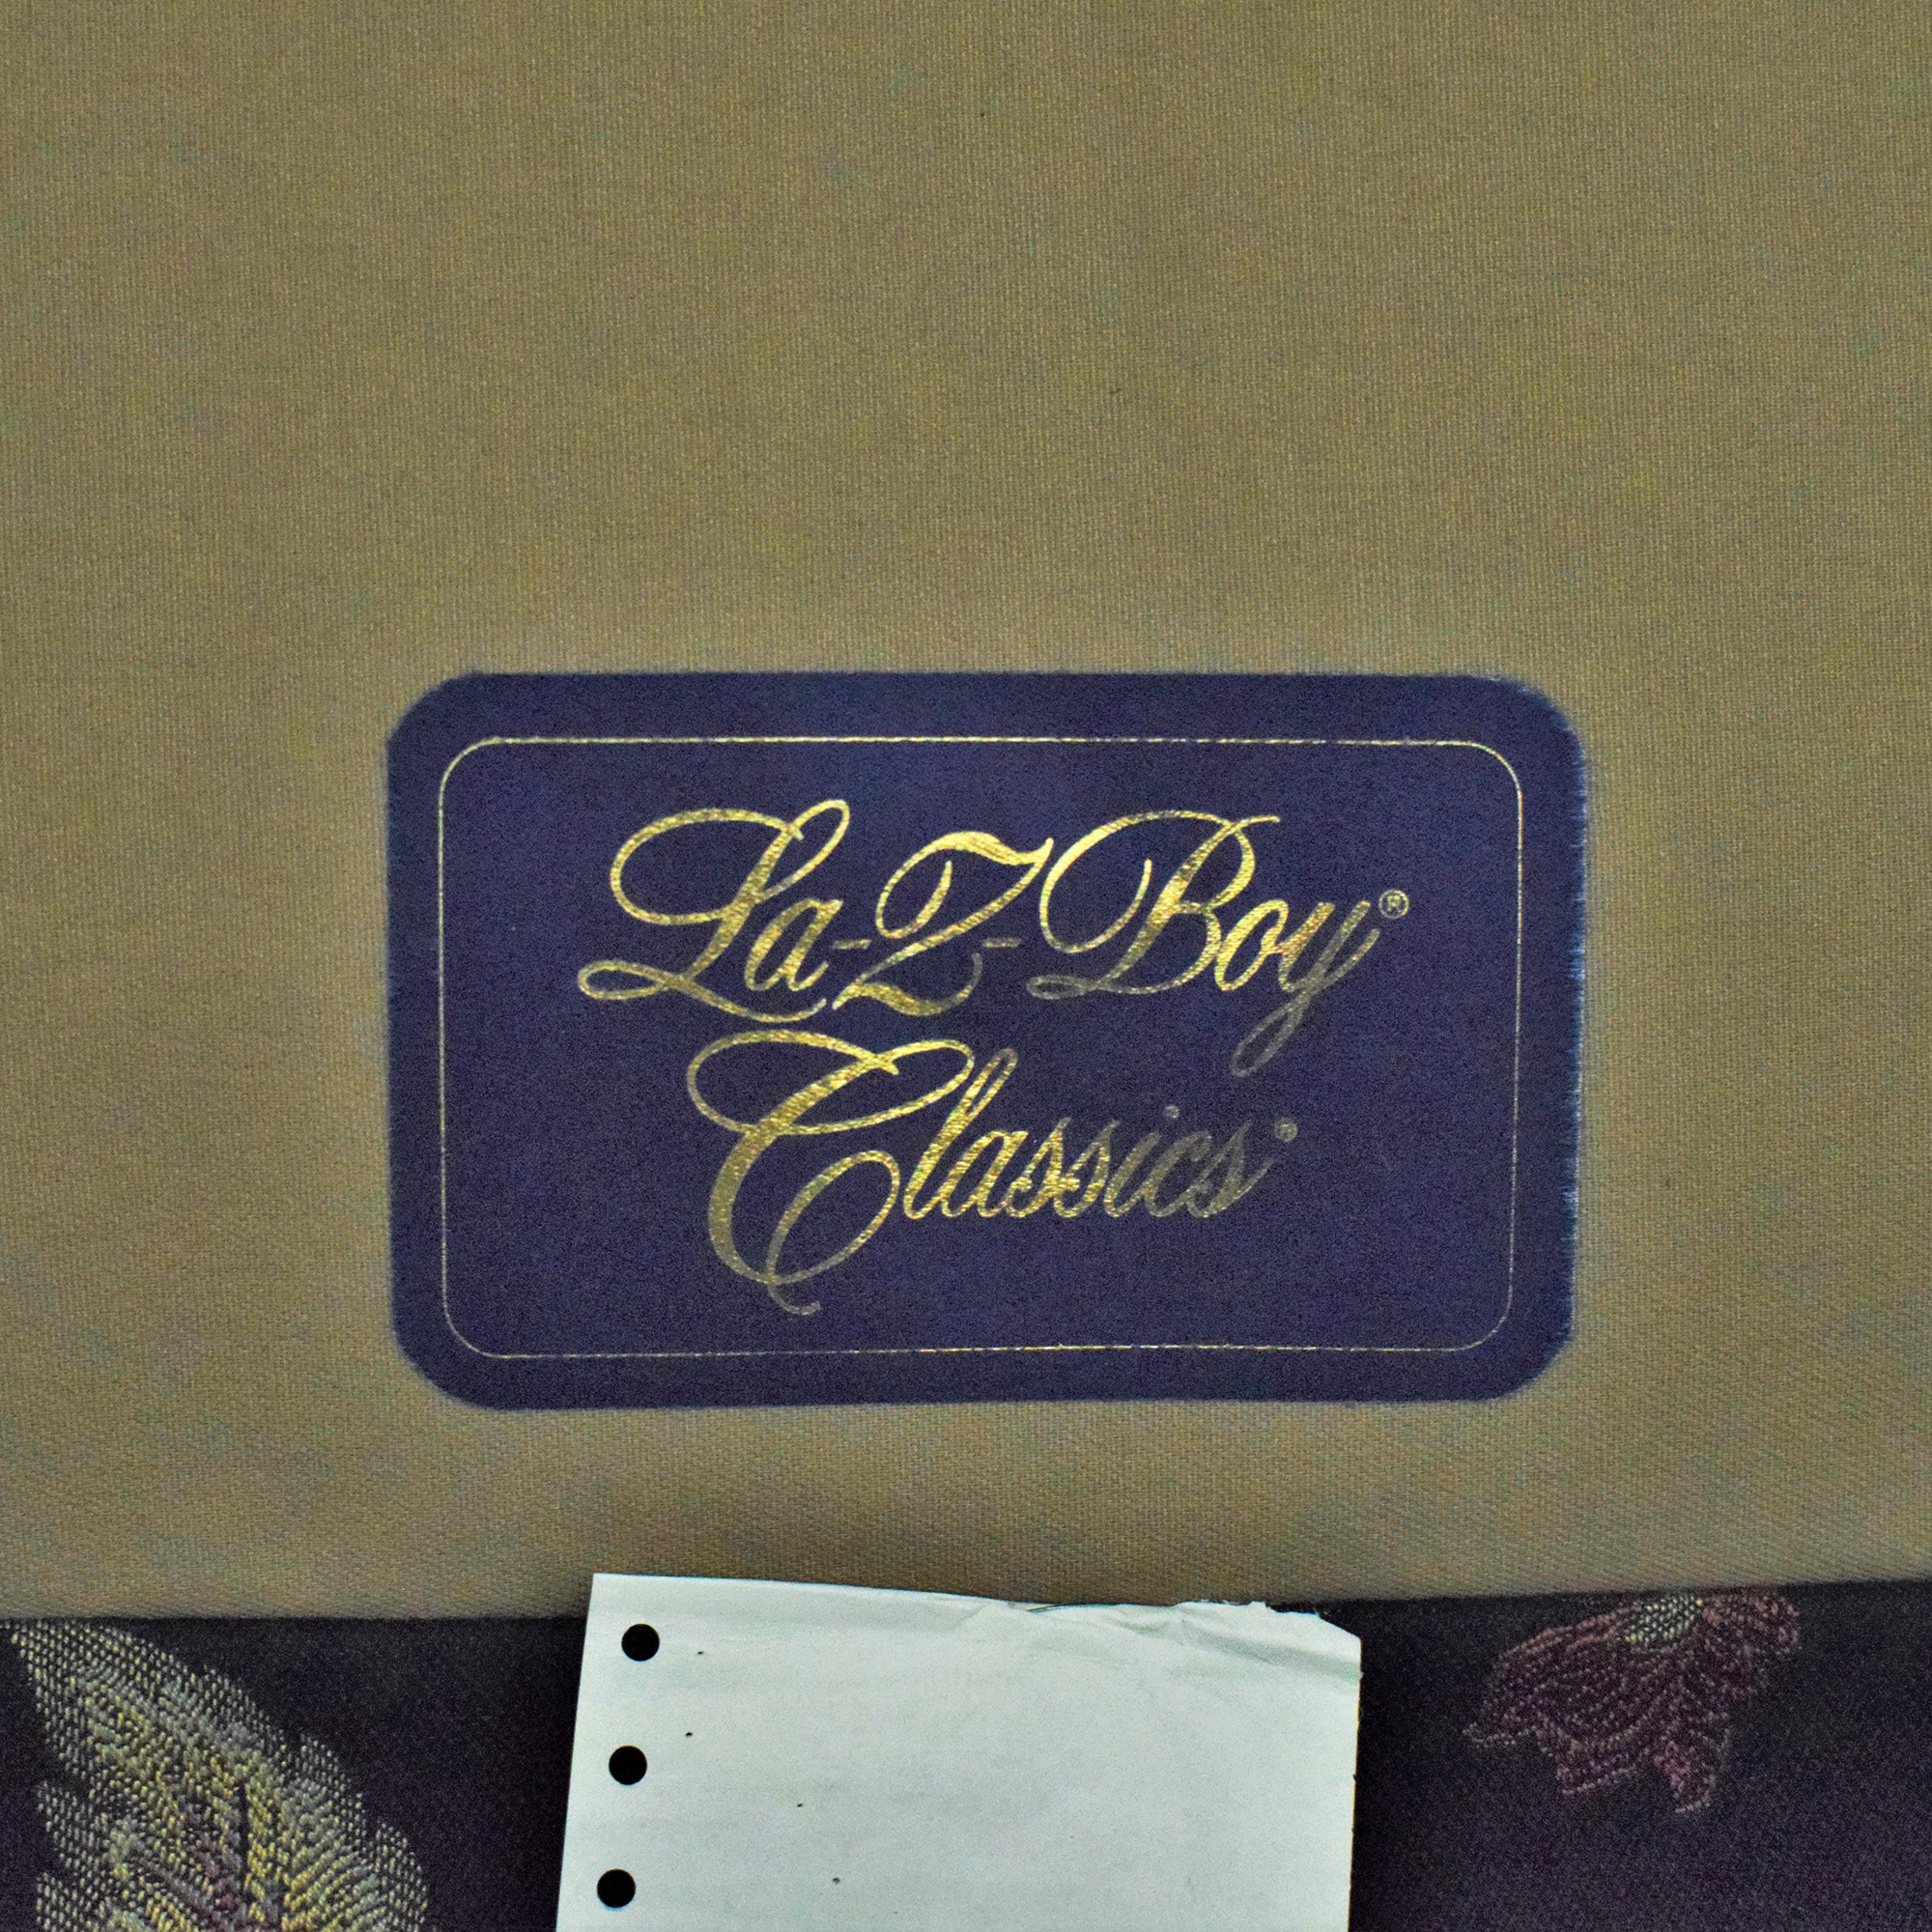 La-Z-Boy La-Z-Boy Classics Recliner used